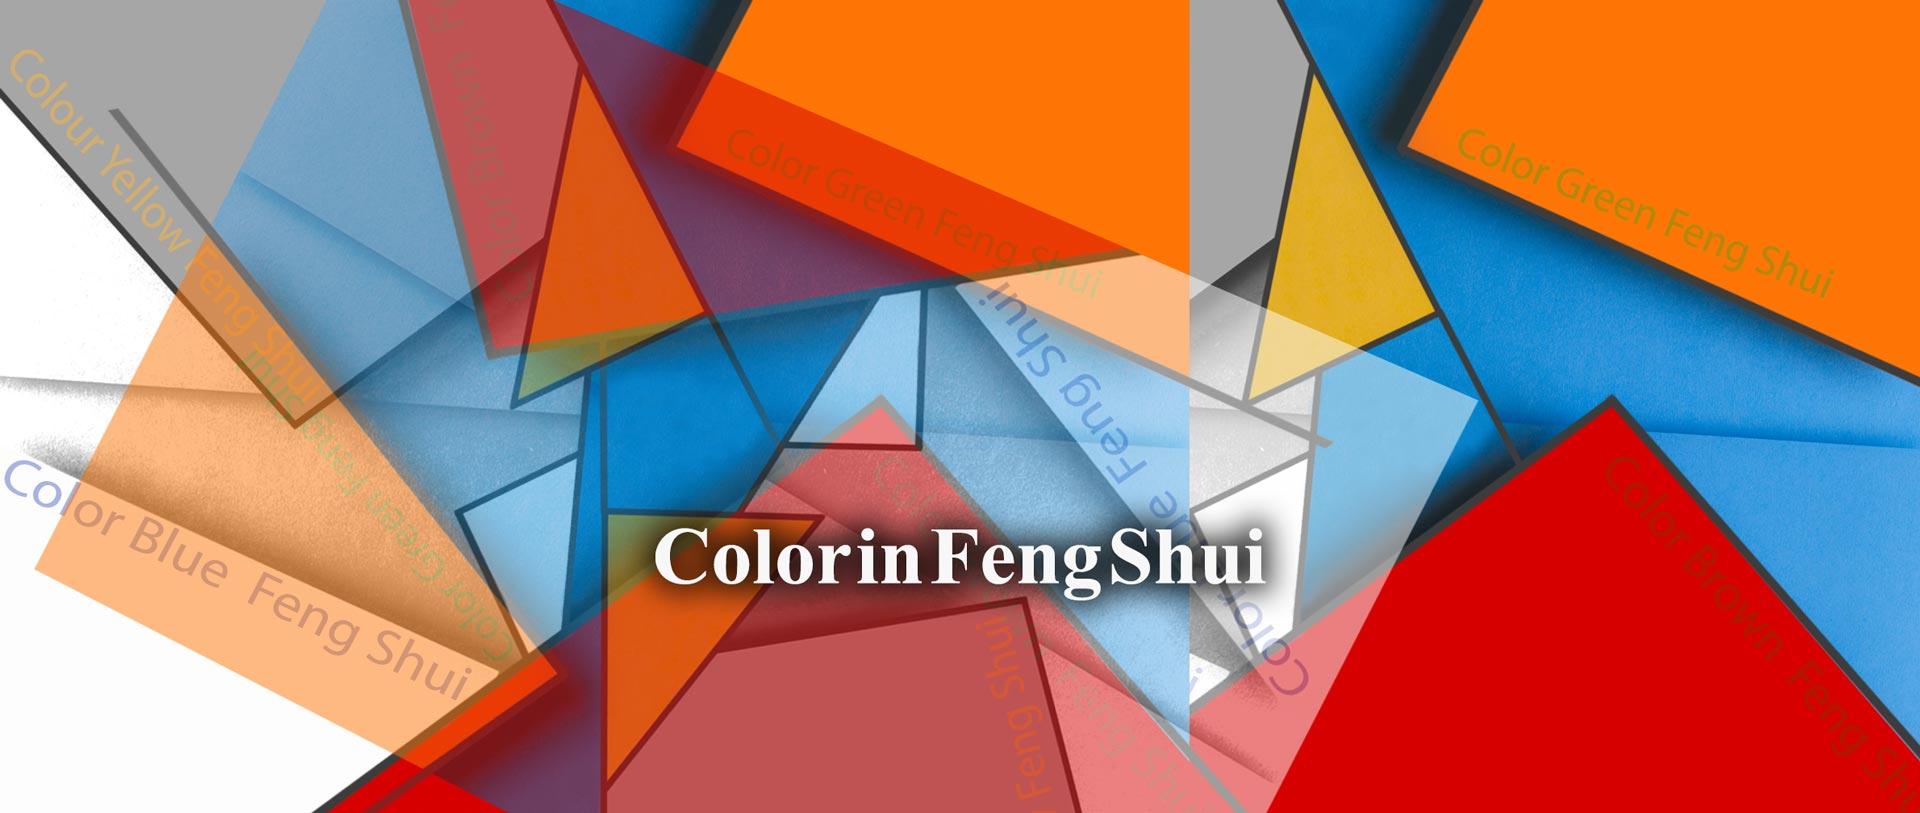 Feng Shui rang 3s 1 - فنگ شویی رنگ ها ، رنگ شناسی فنگ شویی